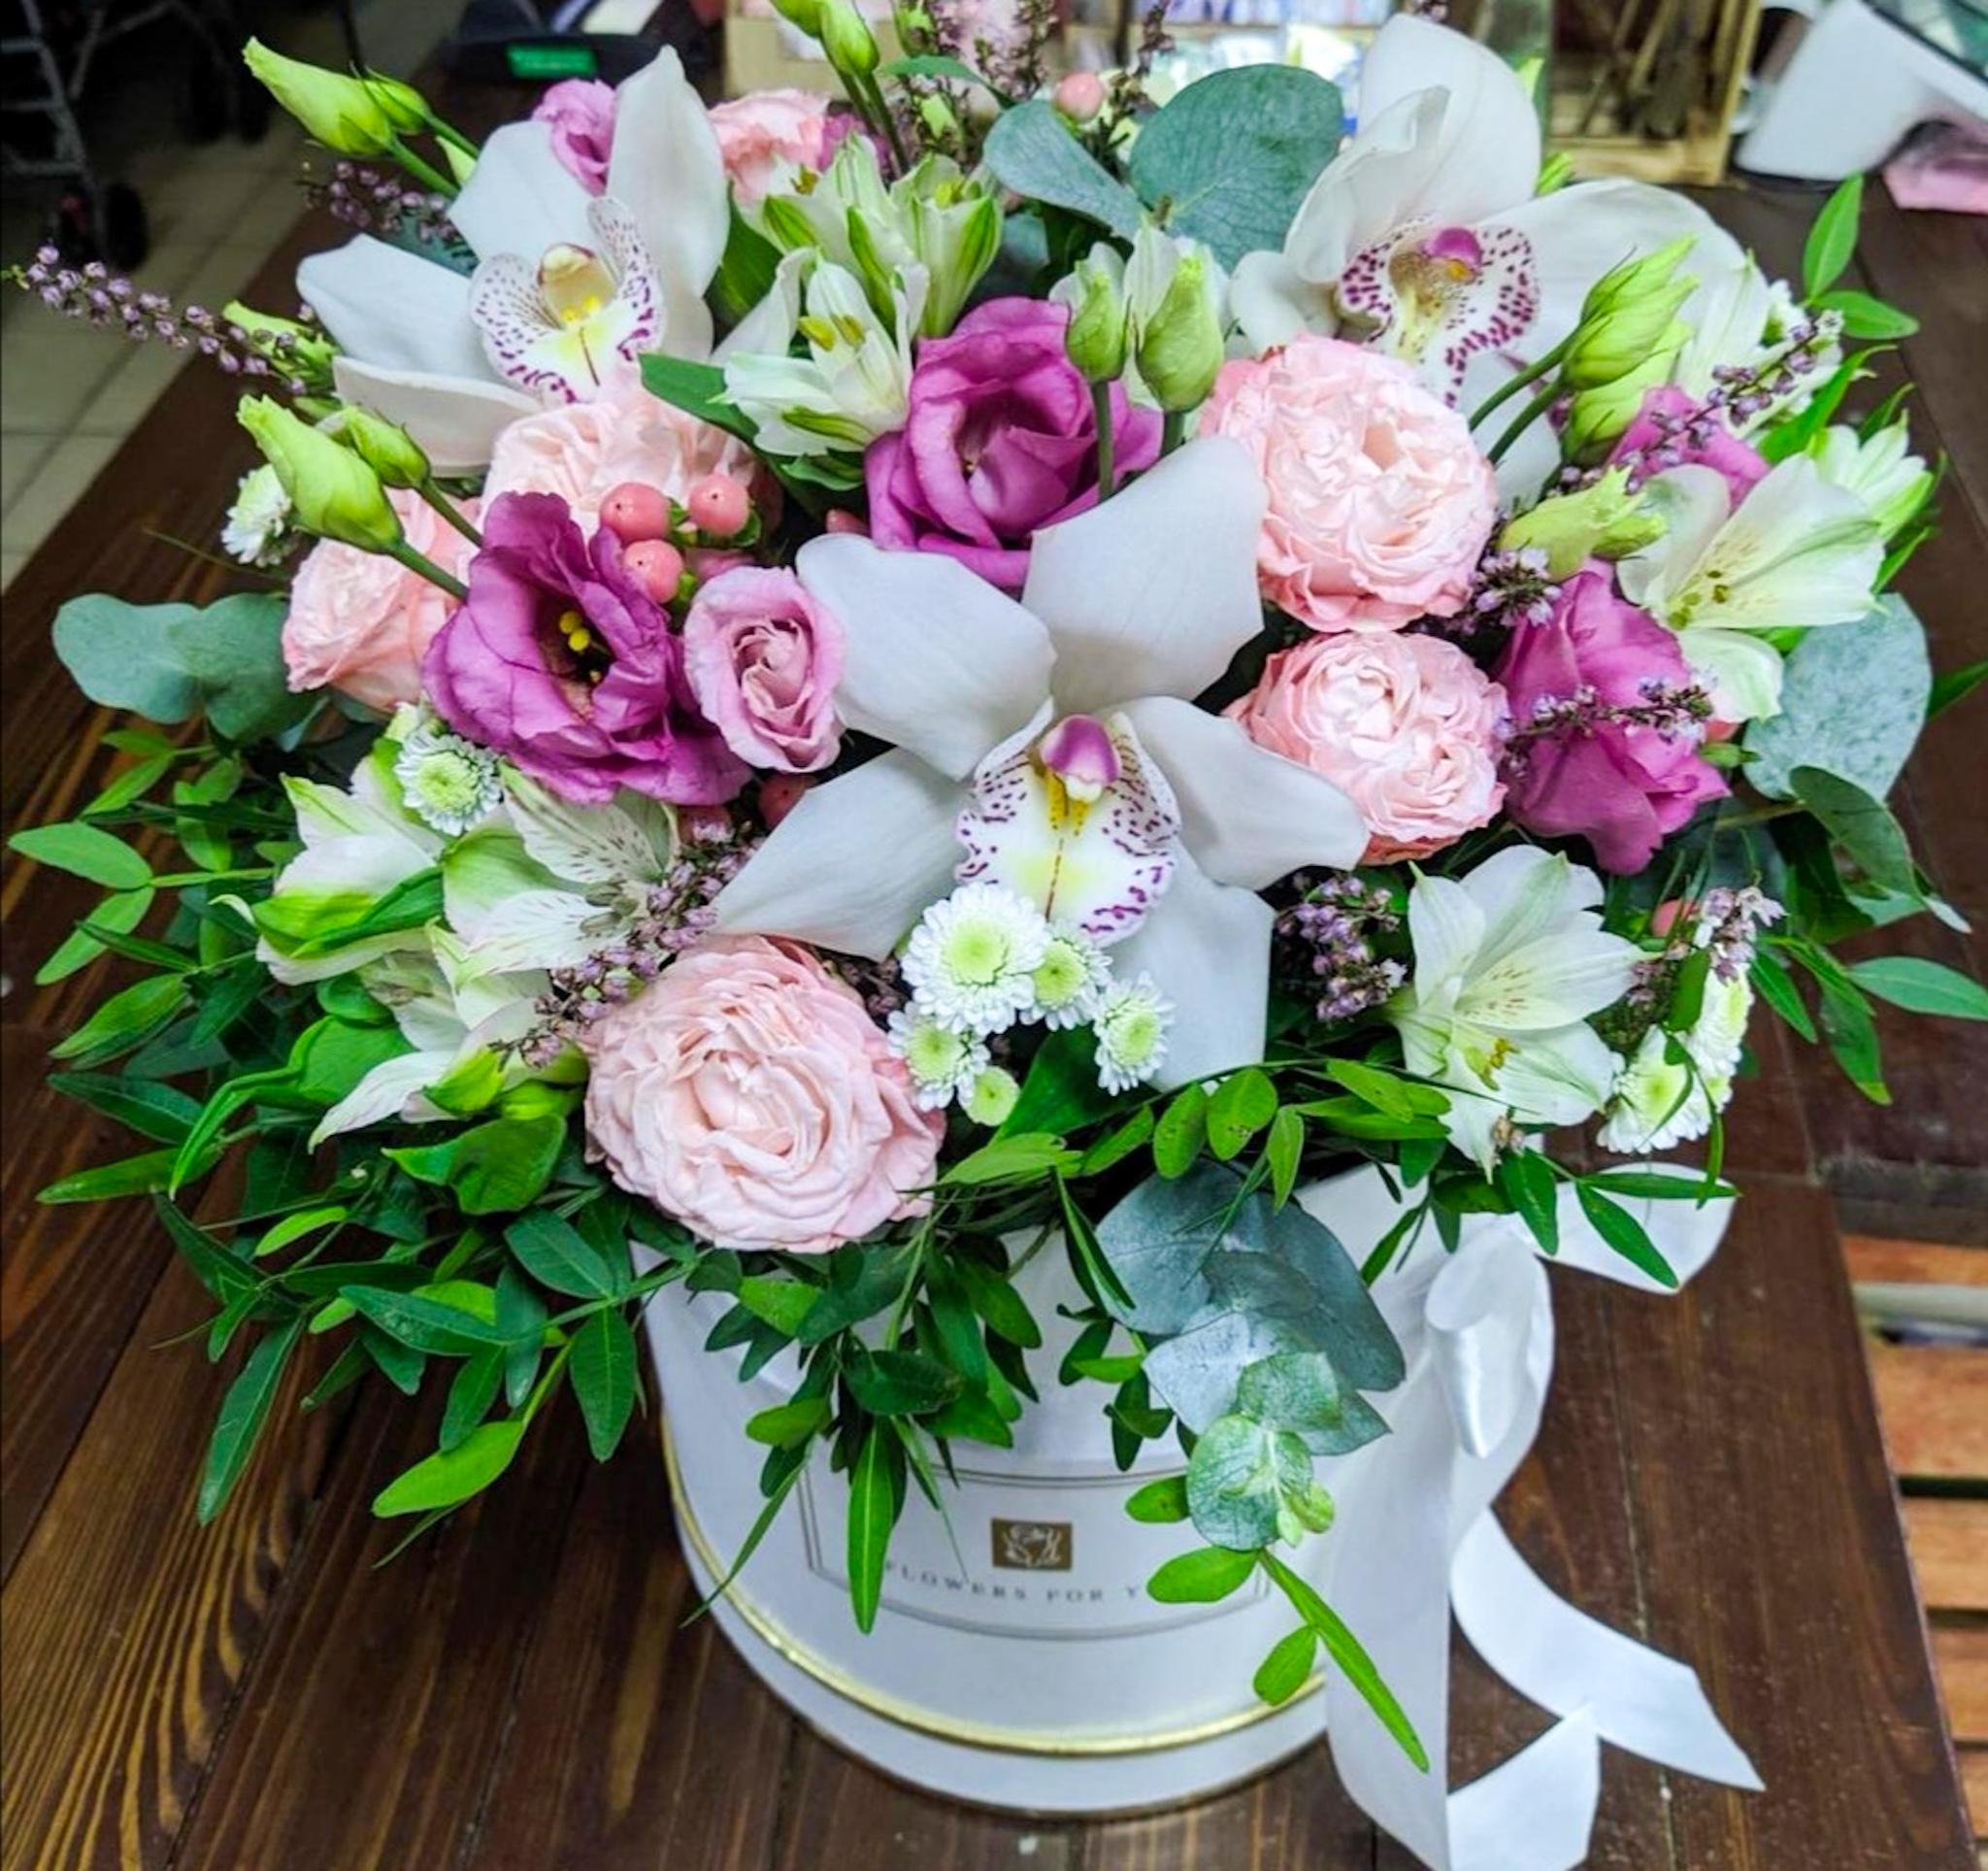 Коробочка с пионовидными розами Бомбастик